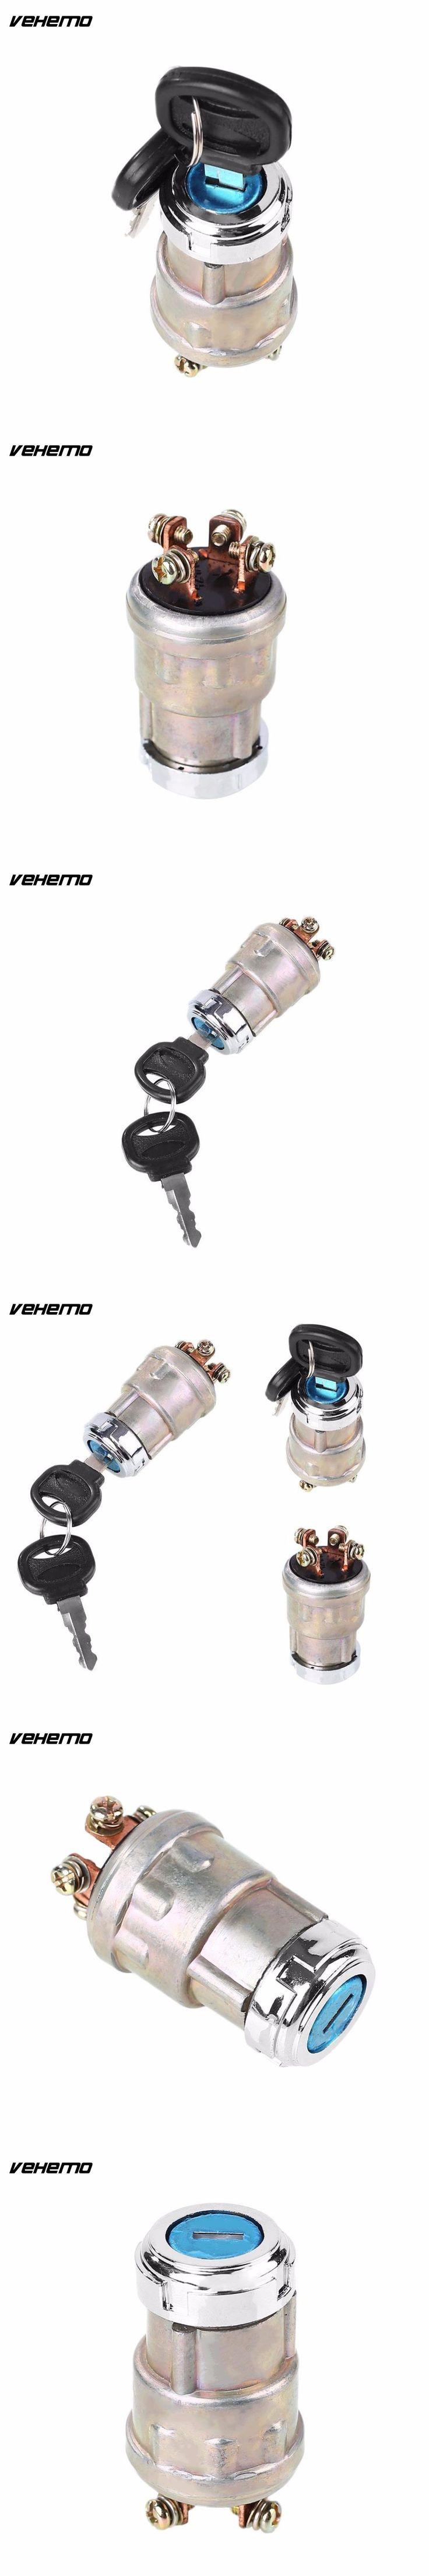 Vehemo Car Auto Boat 12V Alloy 4 Position Ignition Starter Switch w/2 Keys Kit For Petrol Engine